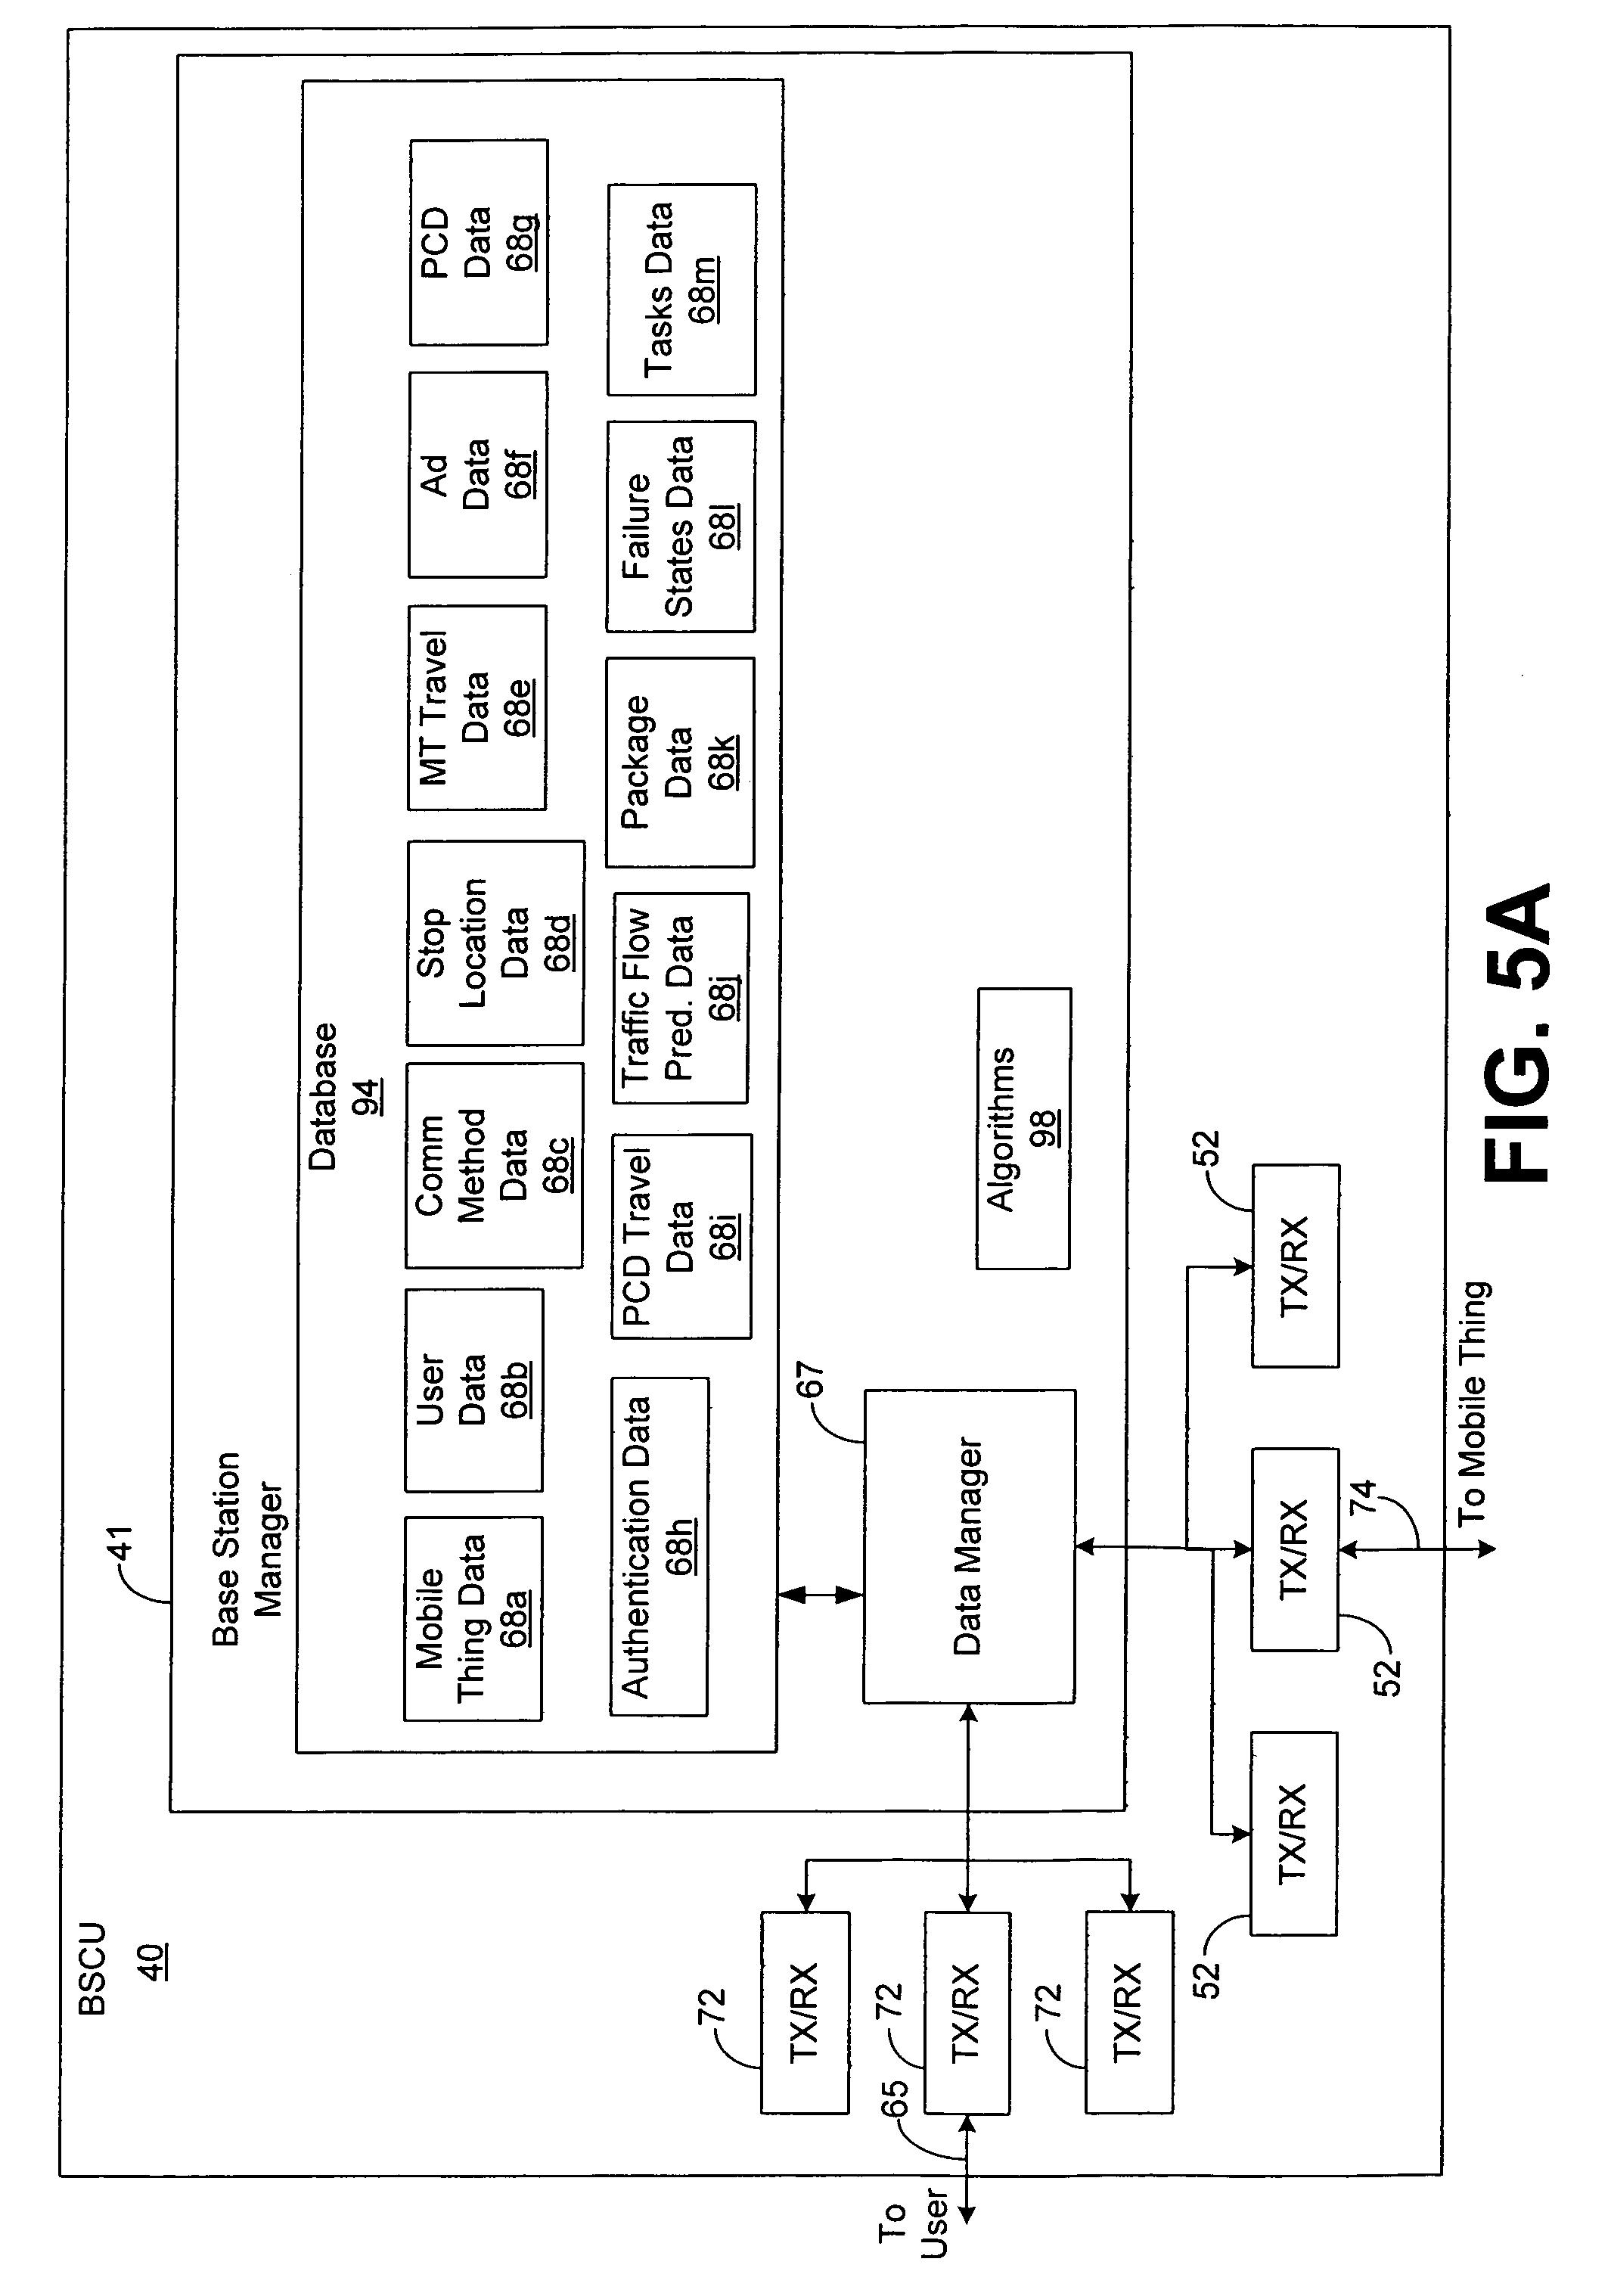 Patent Us 7479900 B2 Audio Indicator By 741